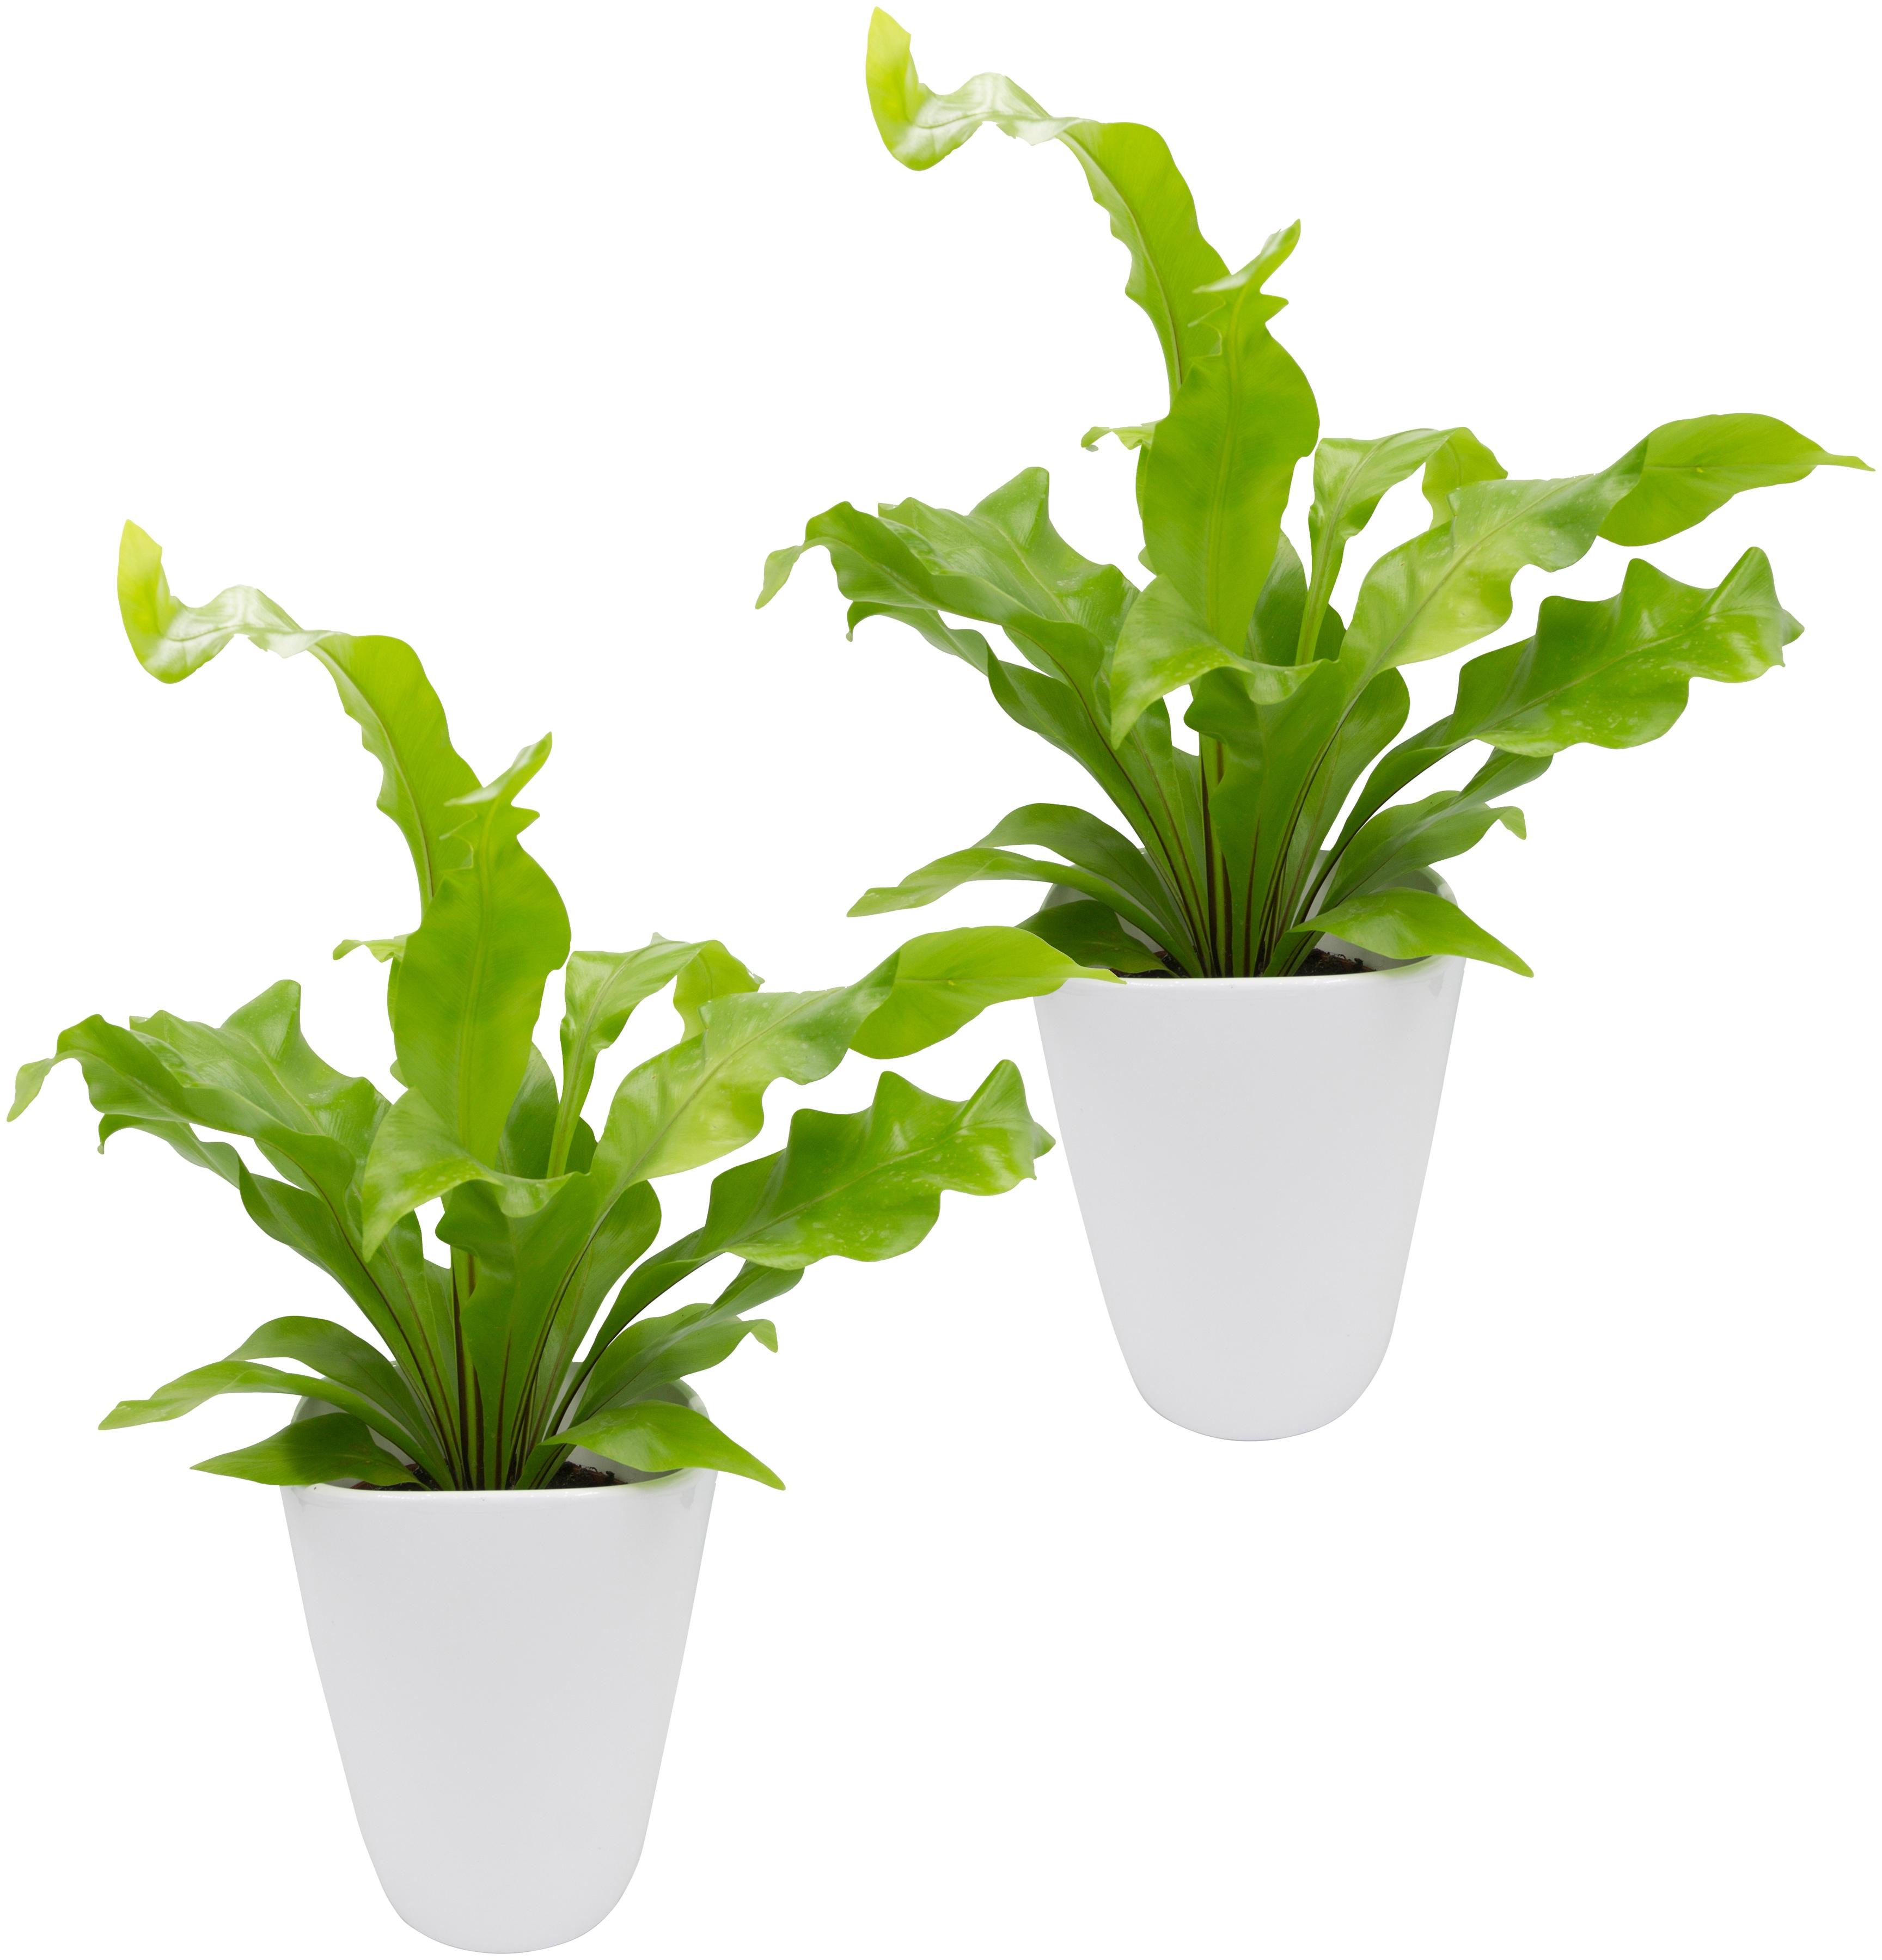 Dominik Zimmerpflanze Farnpflanzen, Höhe: 15 cm, 2 Pflanzen in Dekotöpfen grün Zimmerpflanzen Garten Balkon